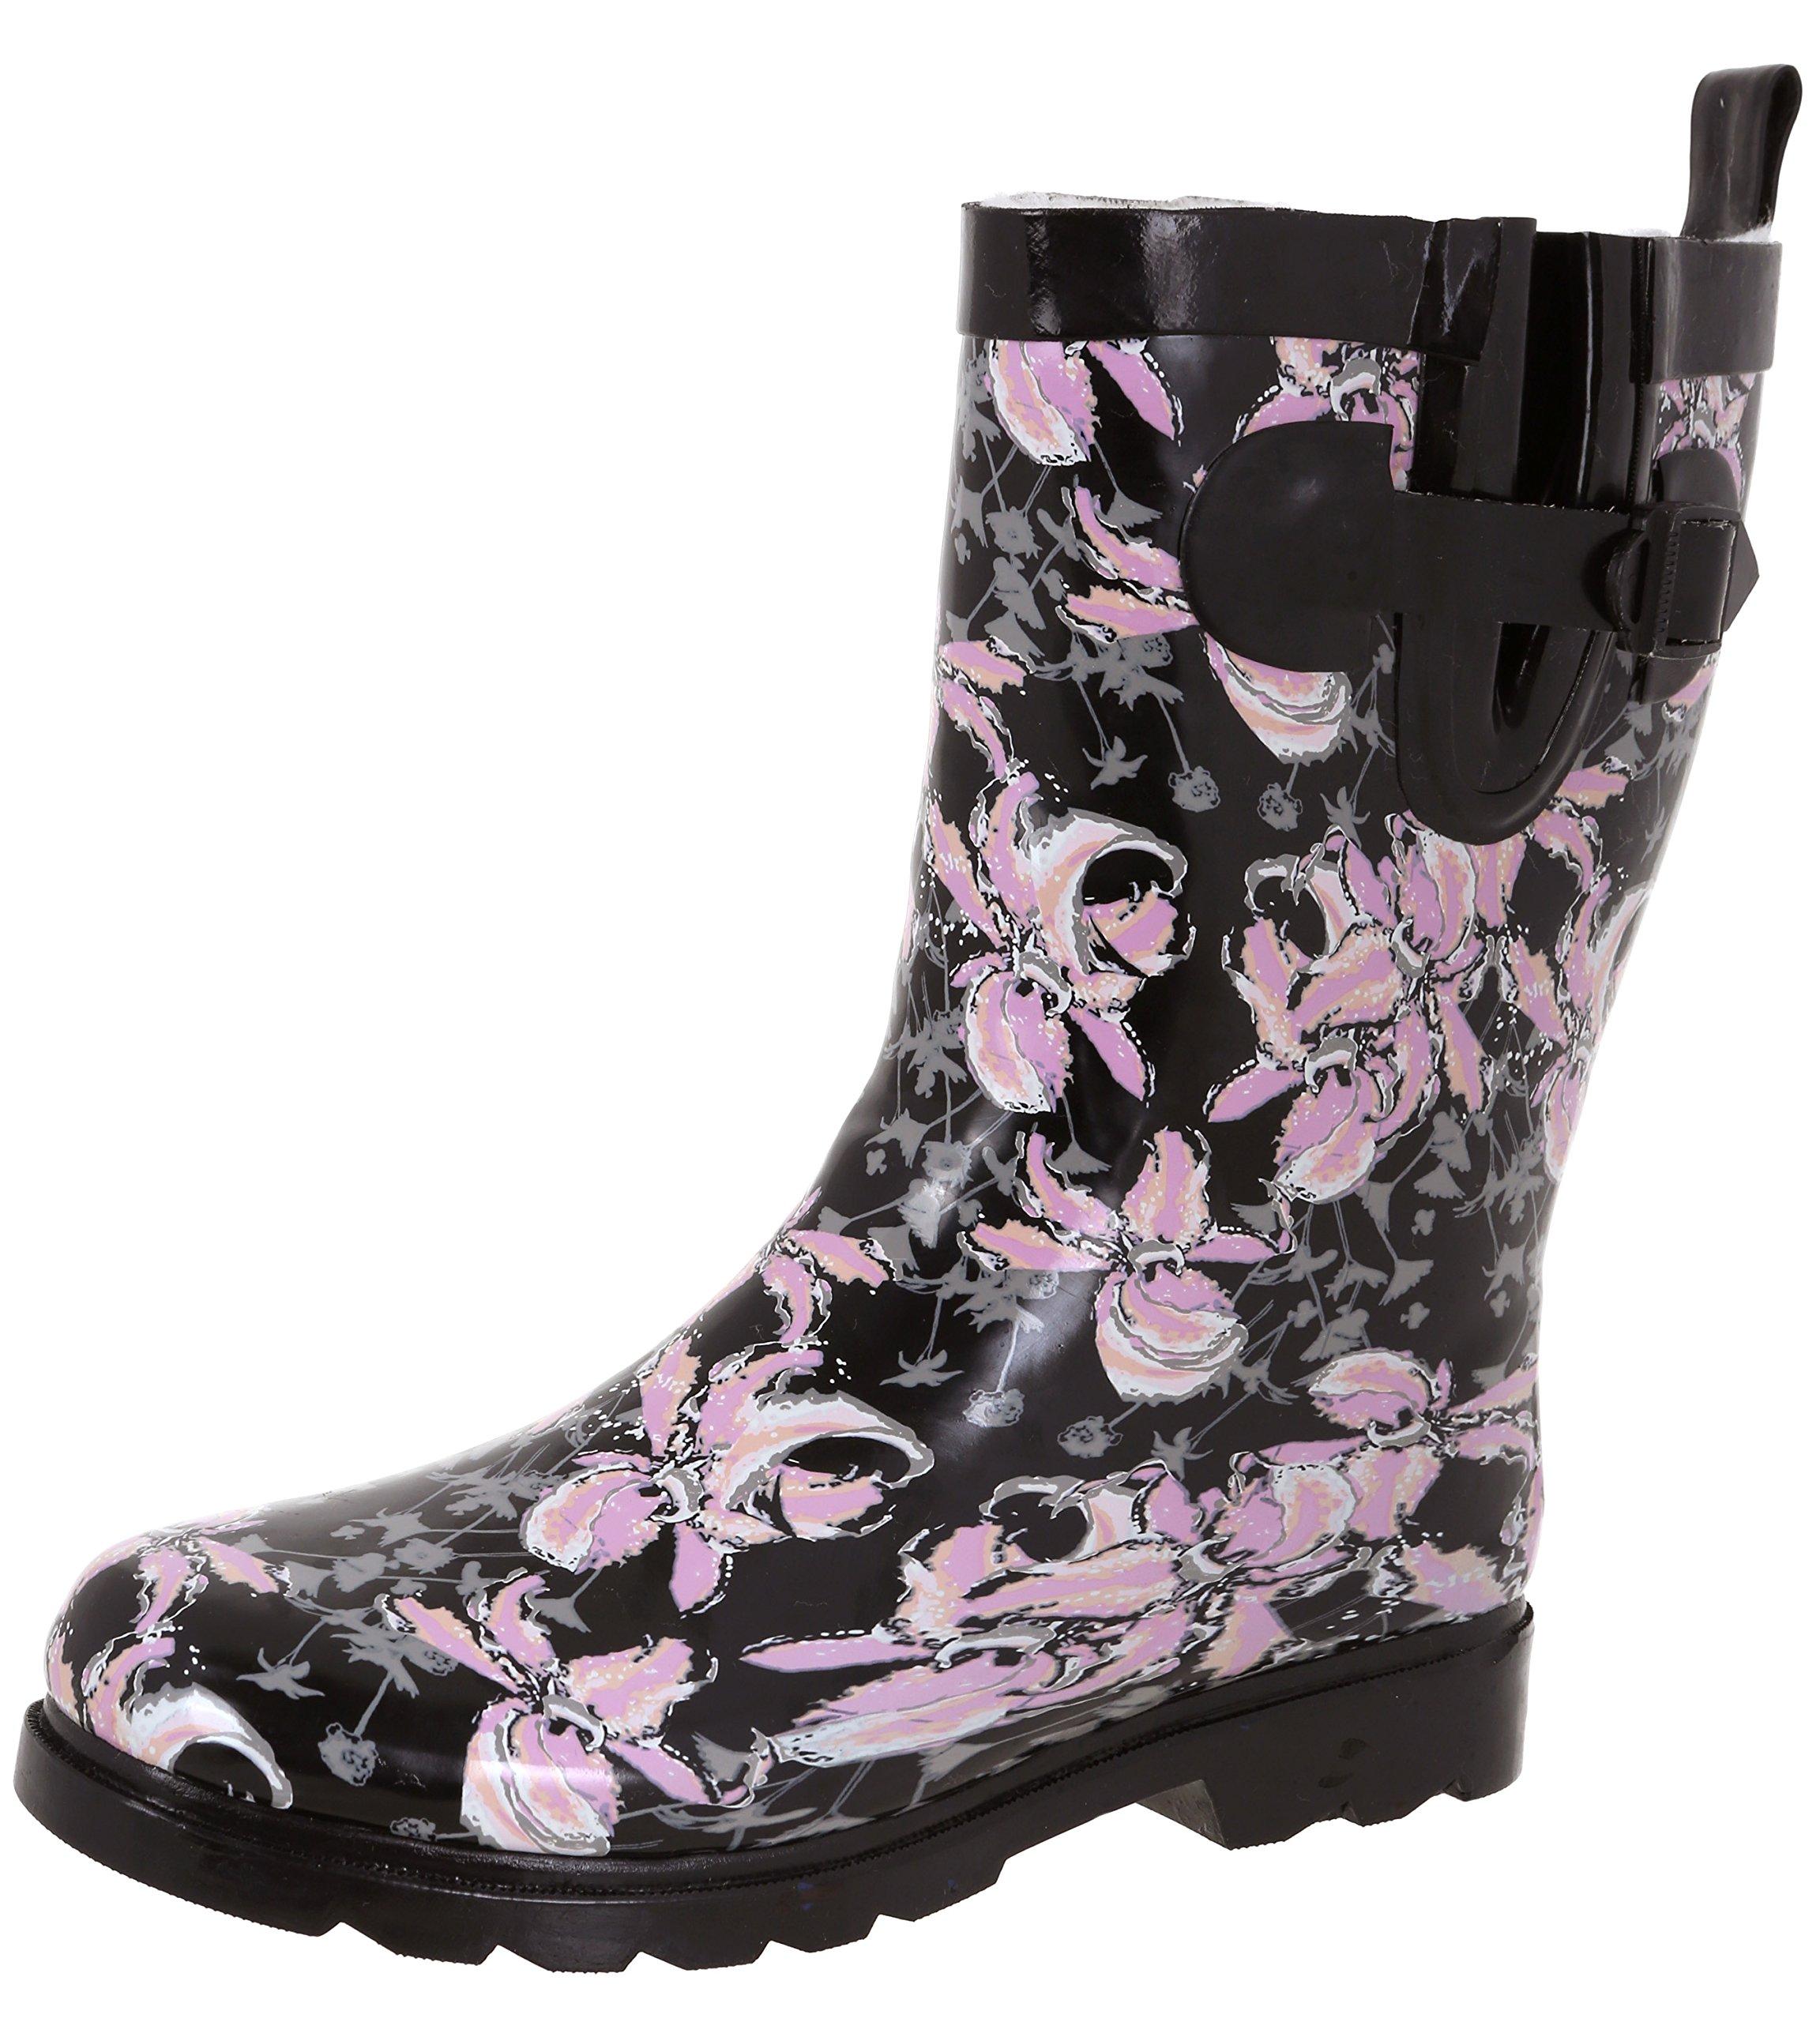 Capelli New York Ladies Shiny Edgy Floral Printed Mid-Calf Rain Boot Black Combo 9